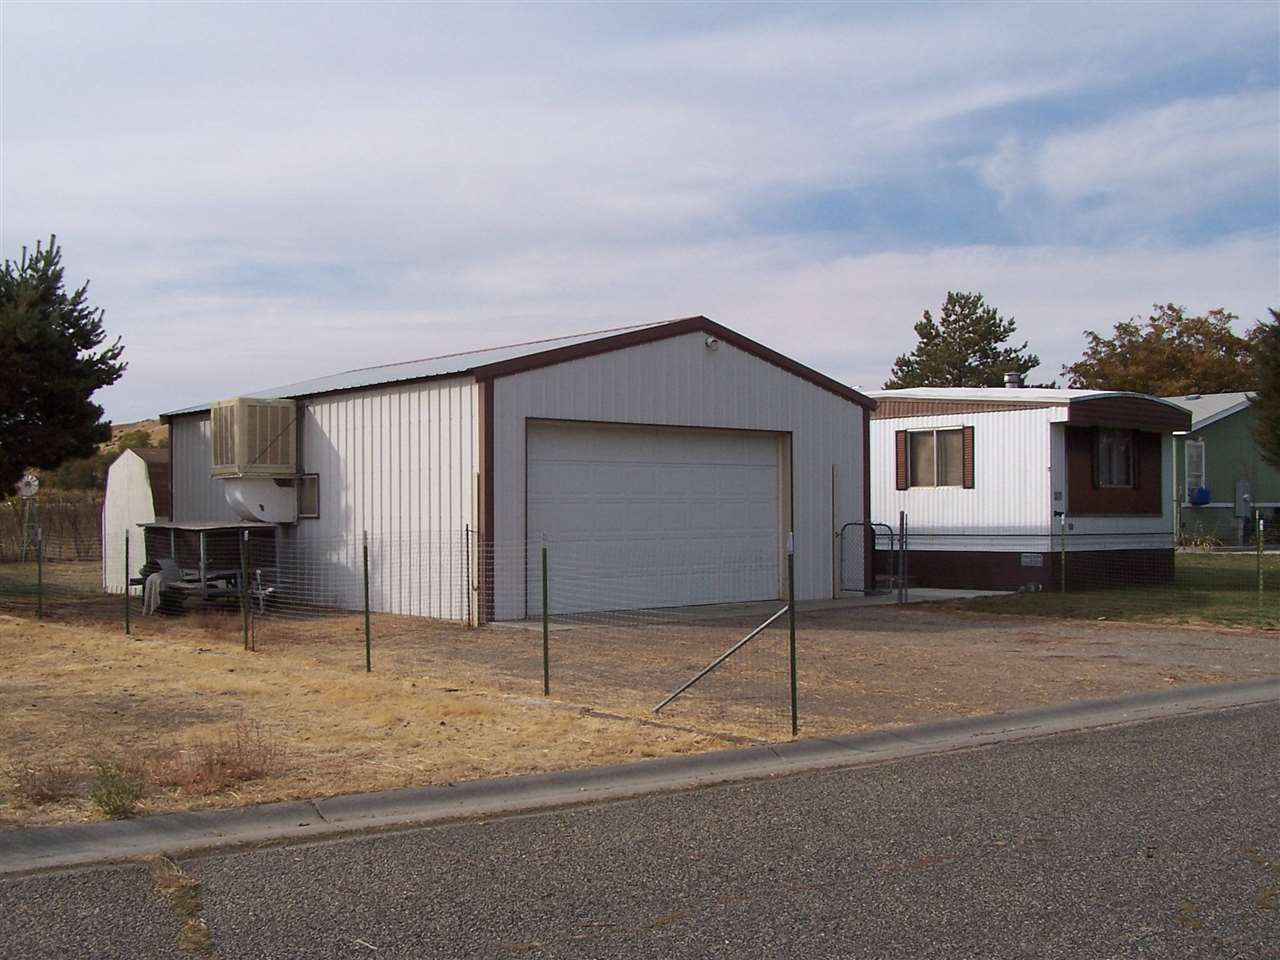 Single Family Home for Sale at 37 N BRADBURY 37 N BRADBURY Glenns Ferry, Idaho 83623